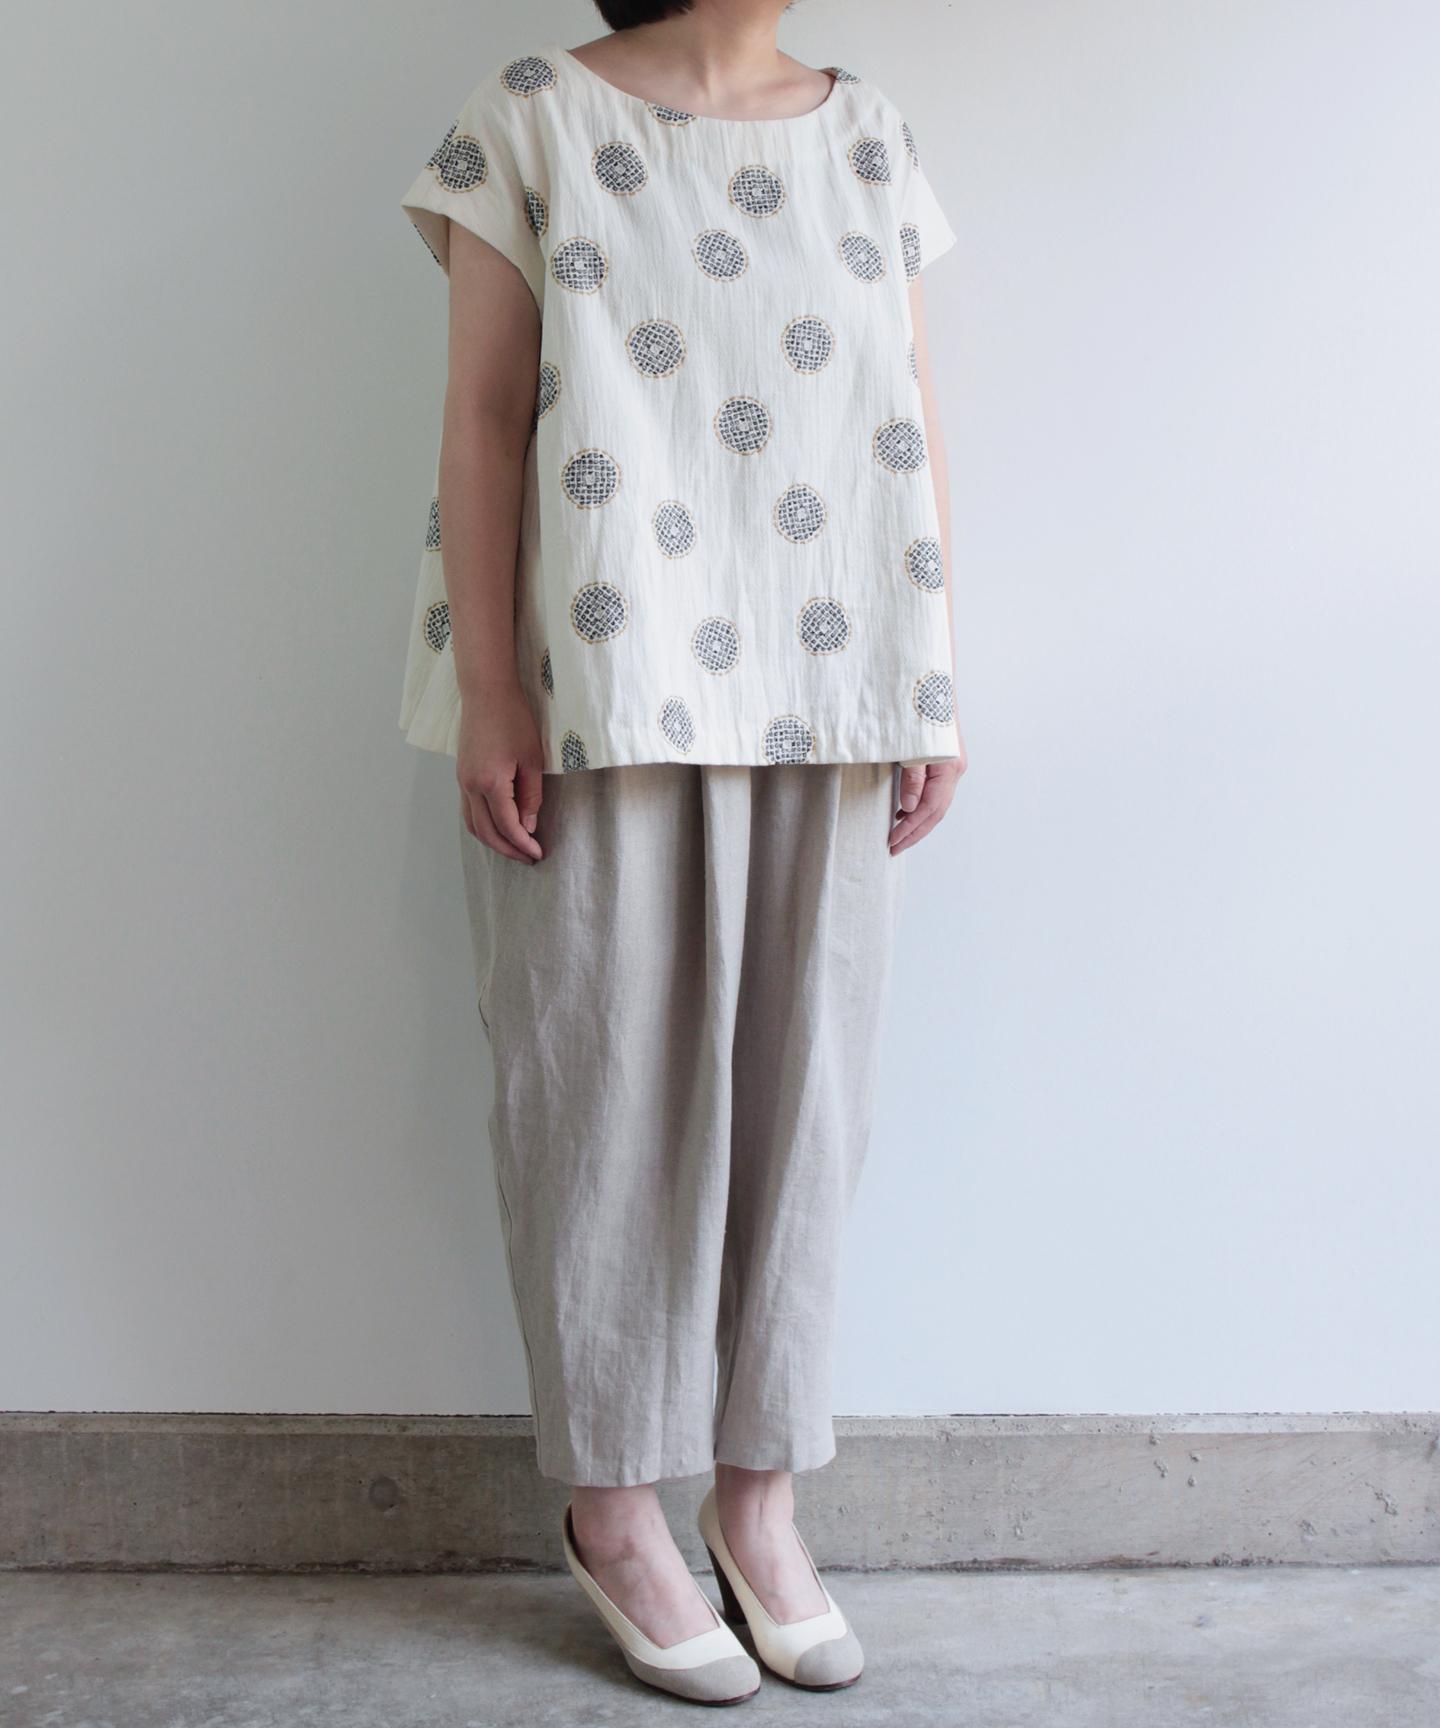 No.7 綿毛刺繍プルオーバー(ev1604985 WHT F)